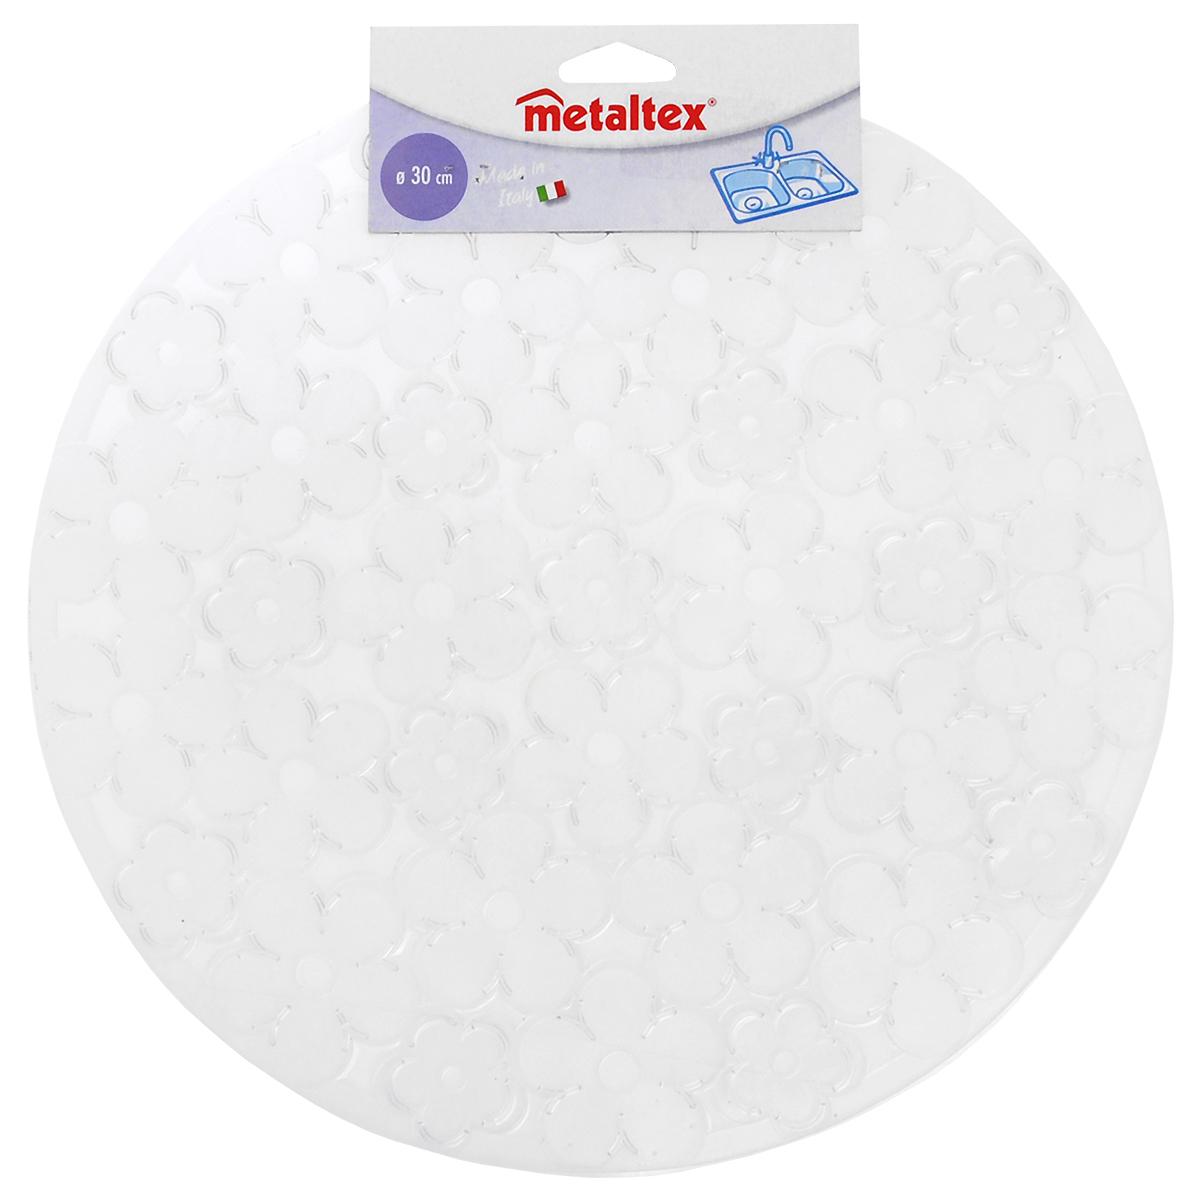 "Коврик для раковины ""Metaltex"", цвет: прозрачный, диаметр 30 см"